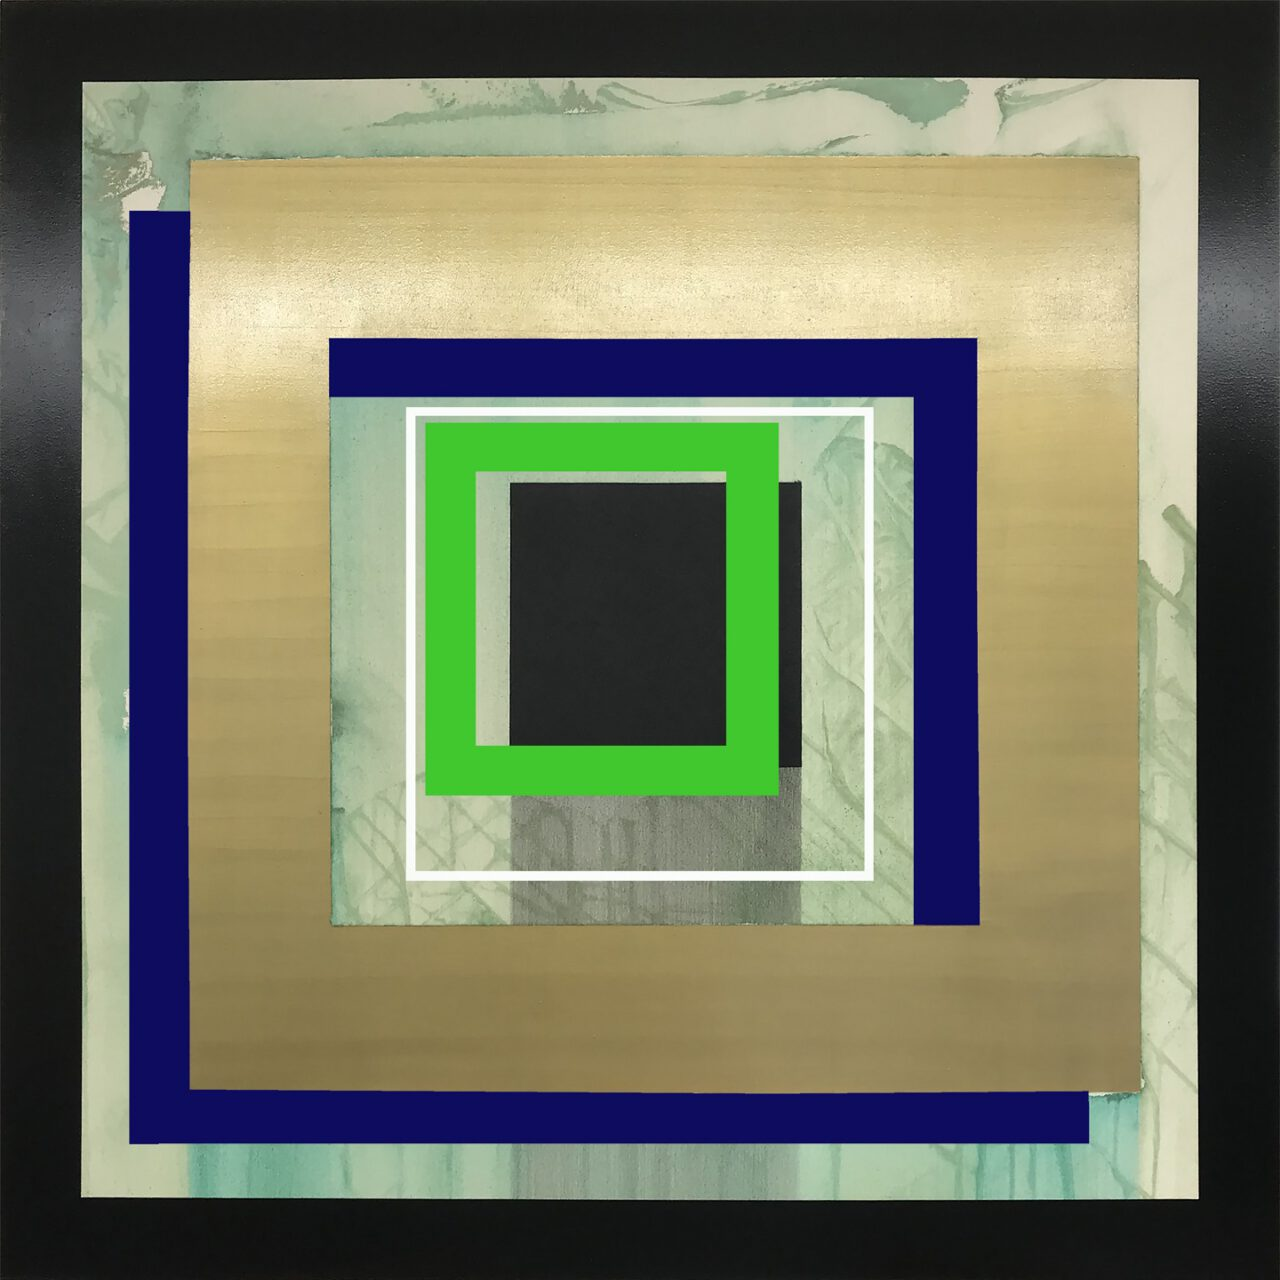 Lars Breuer – Malerei